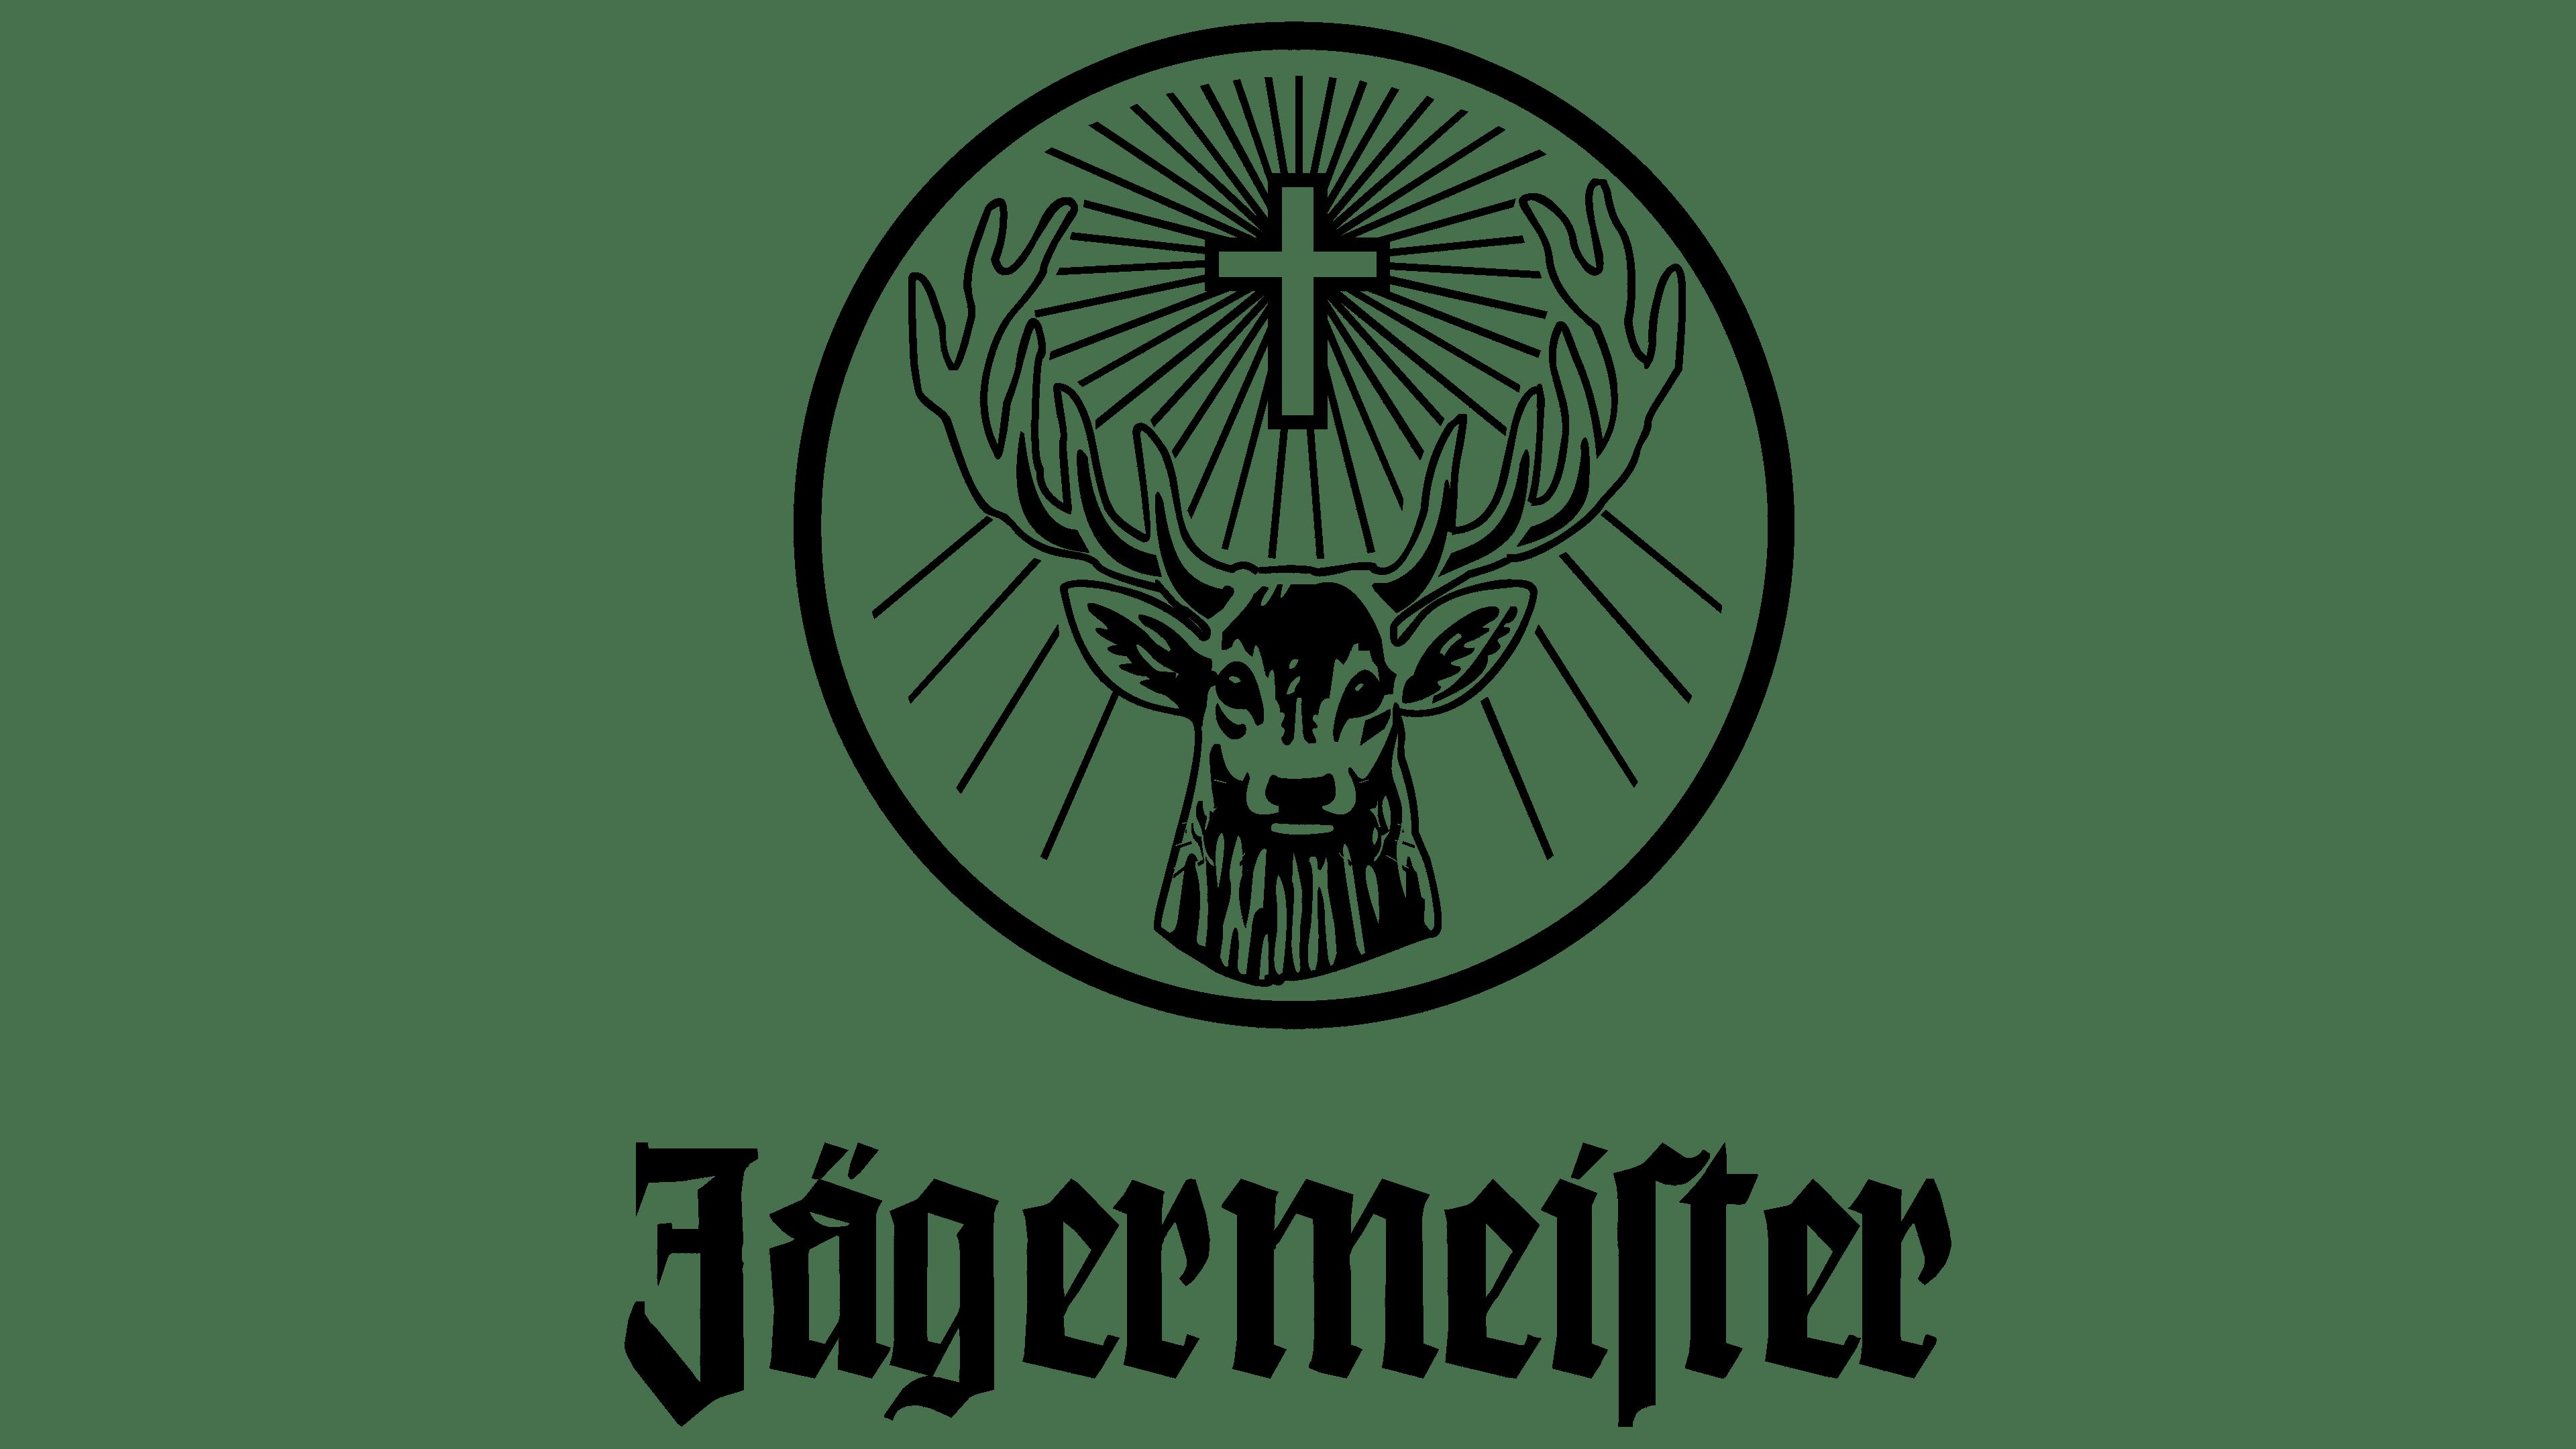 Jagermeister-Emblem